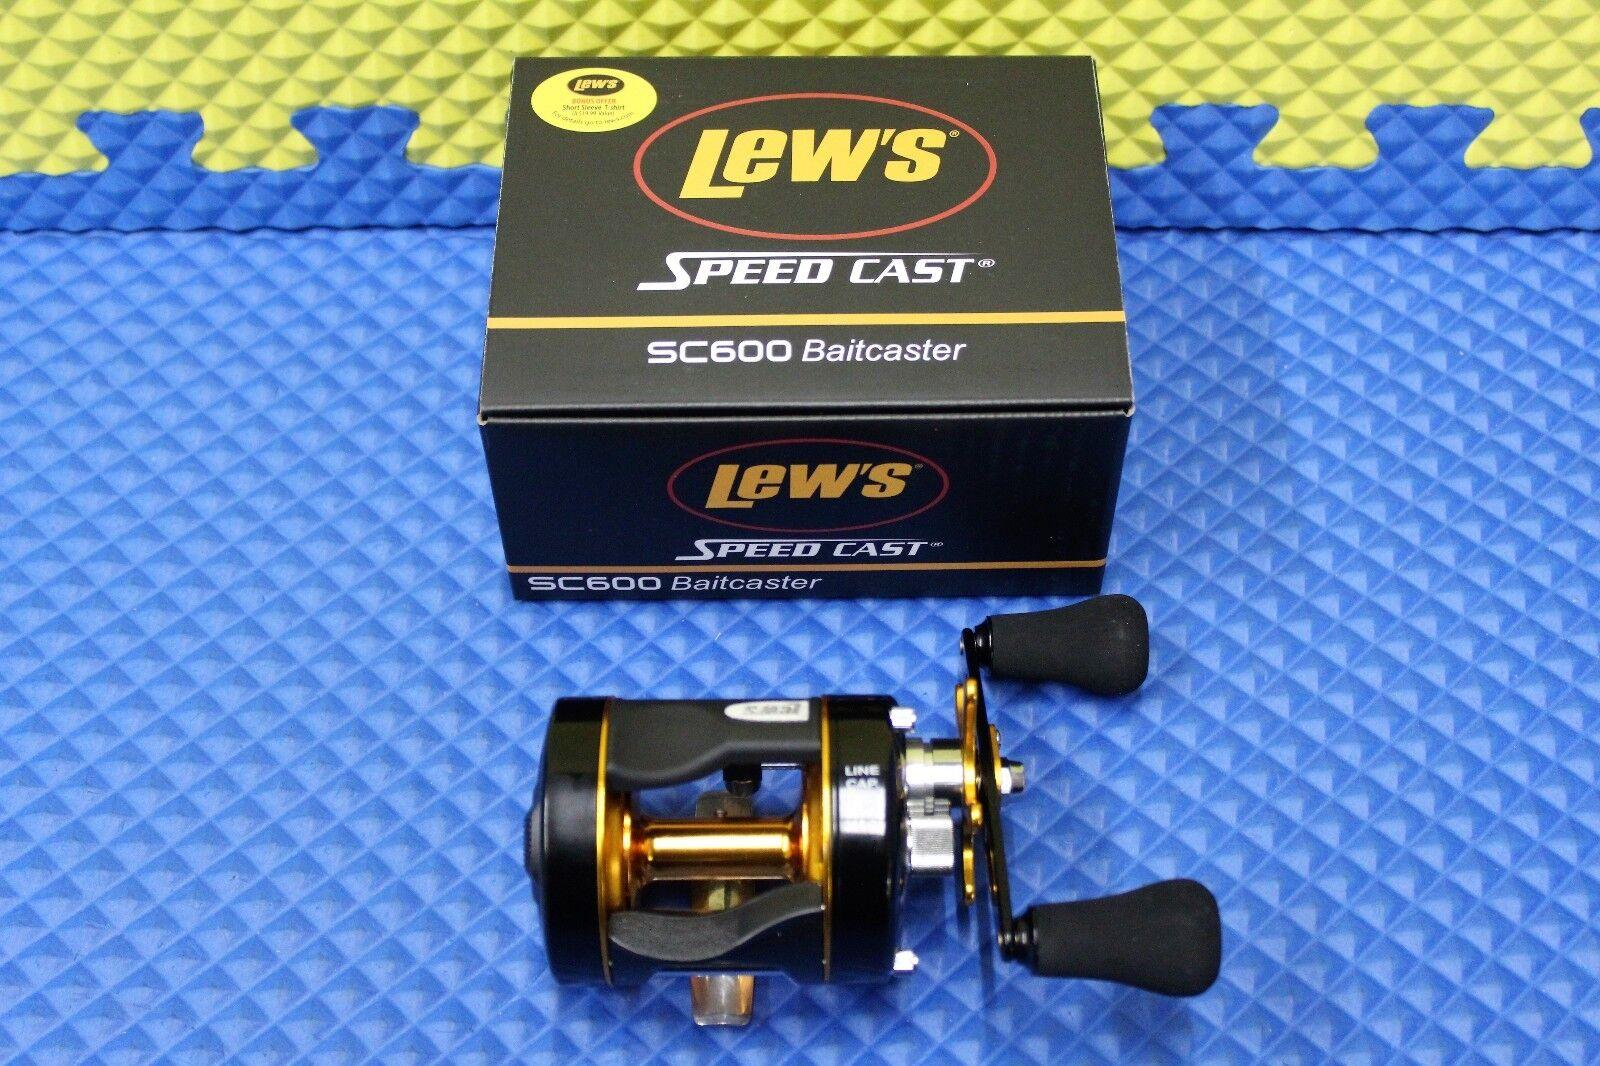 Lew's Speed Cast Baitcaster Reel SC600